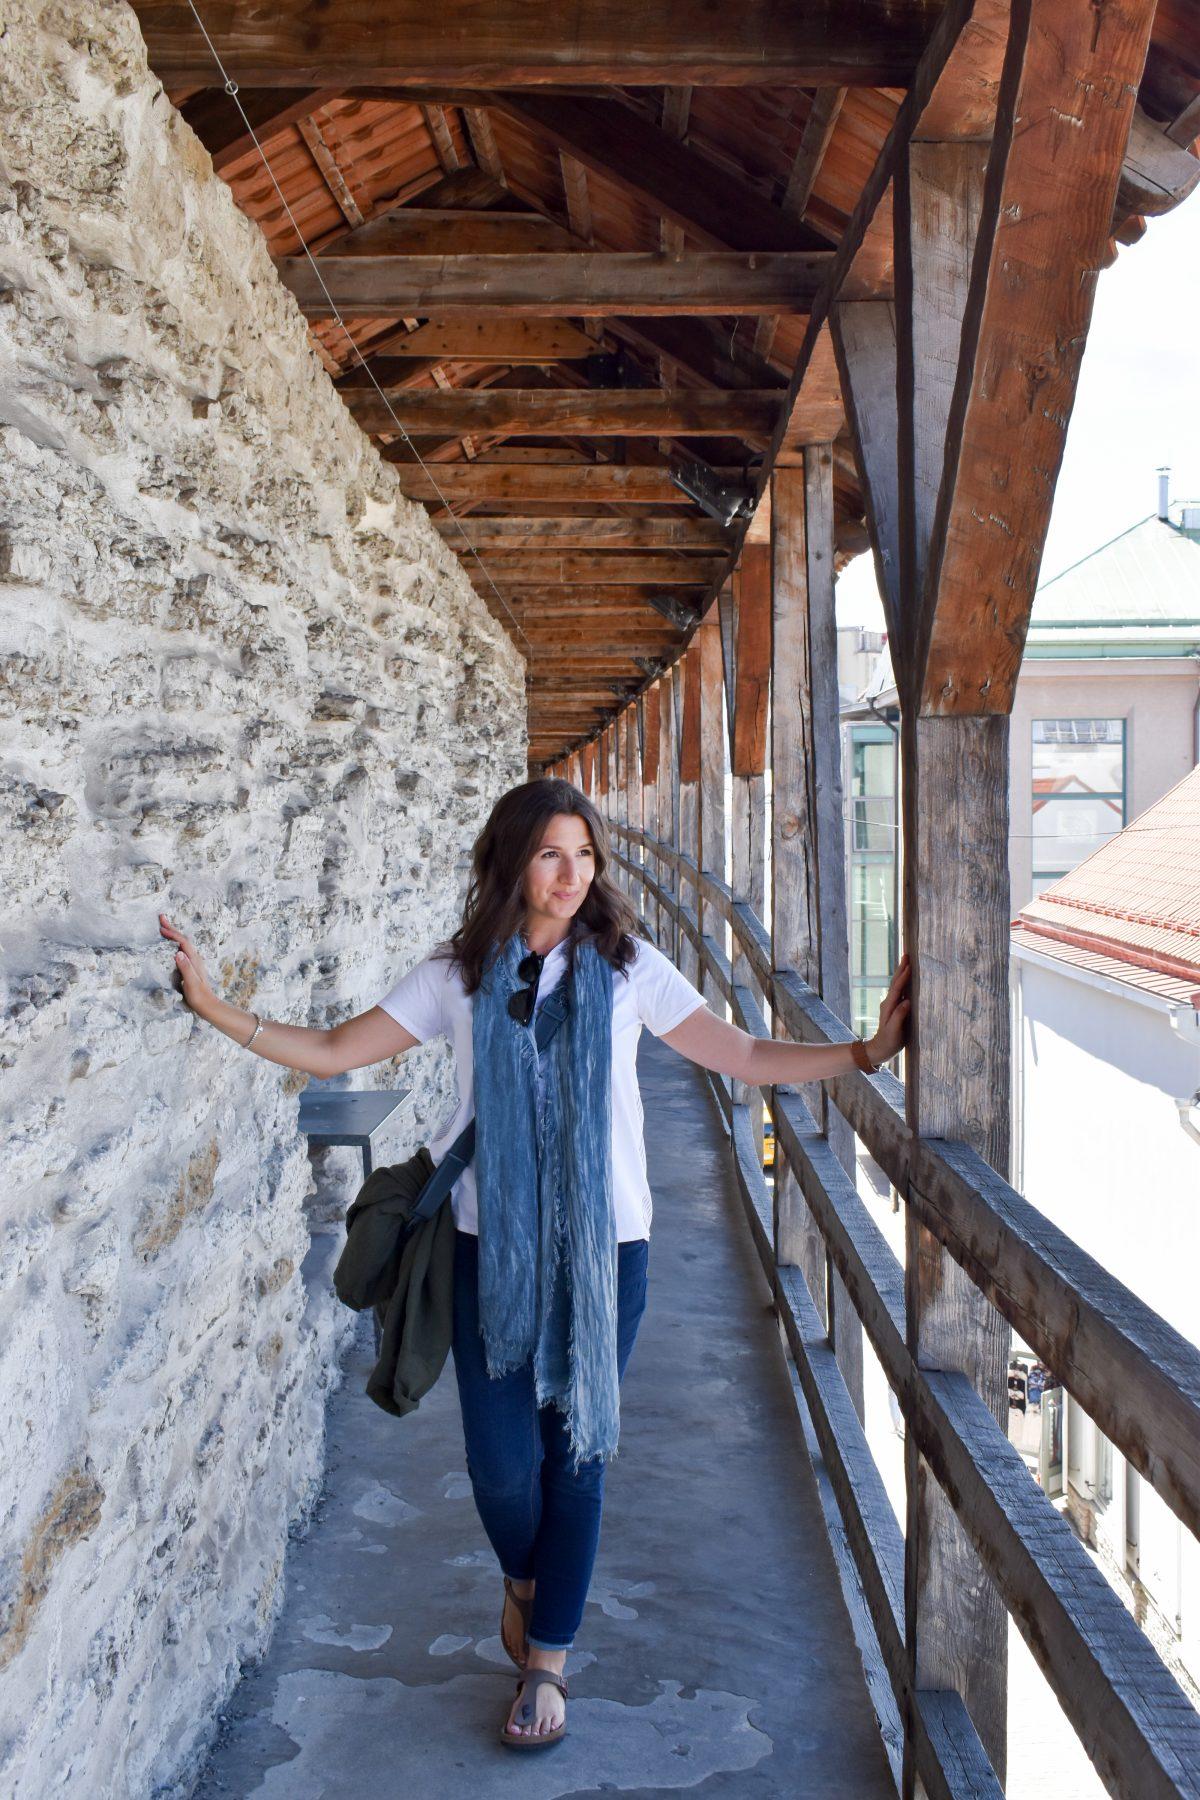 Erin walks the medieval wall in Tallinn Estonia wearing her favorite travel wardrobe essential, a long scarf.